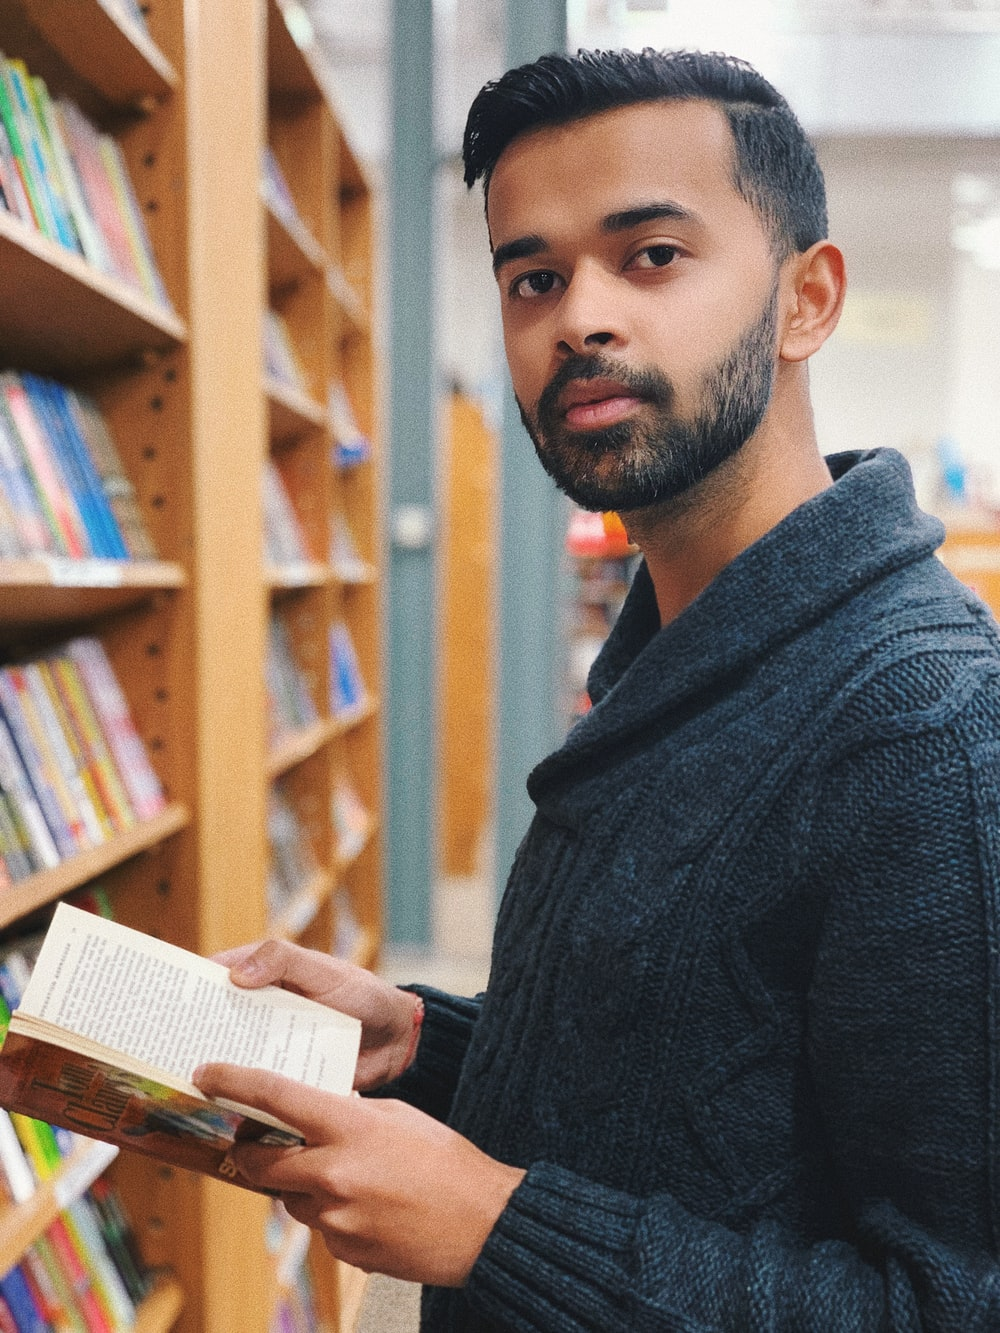 man in black sweater reading book